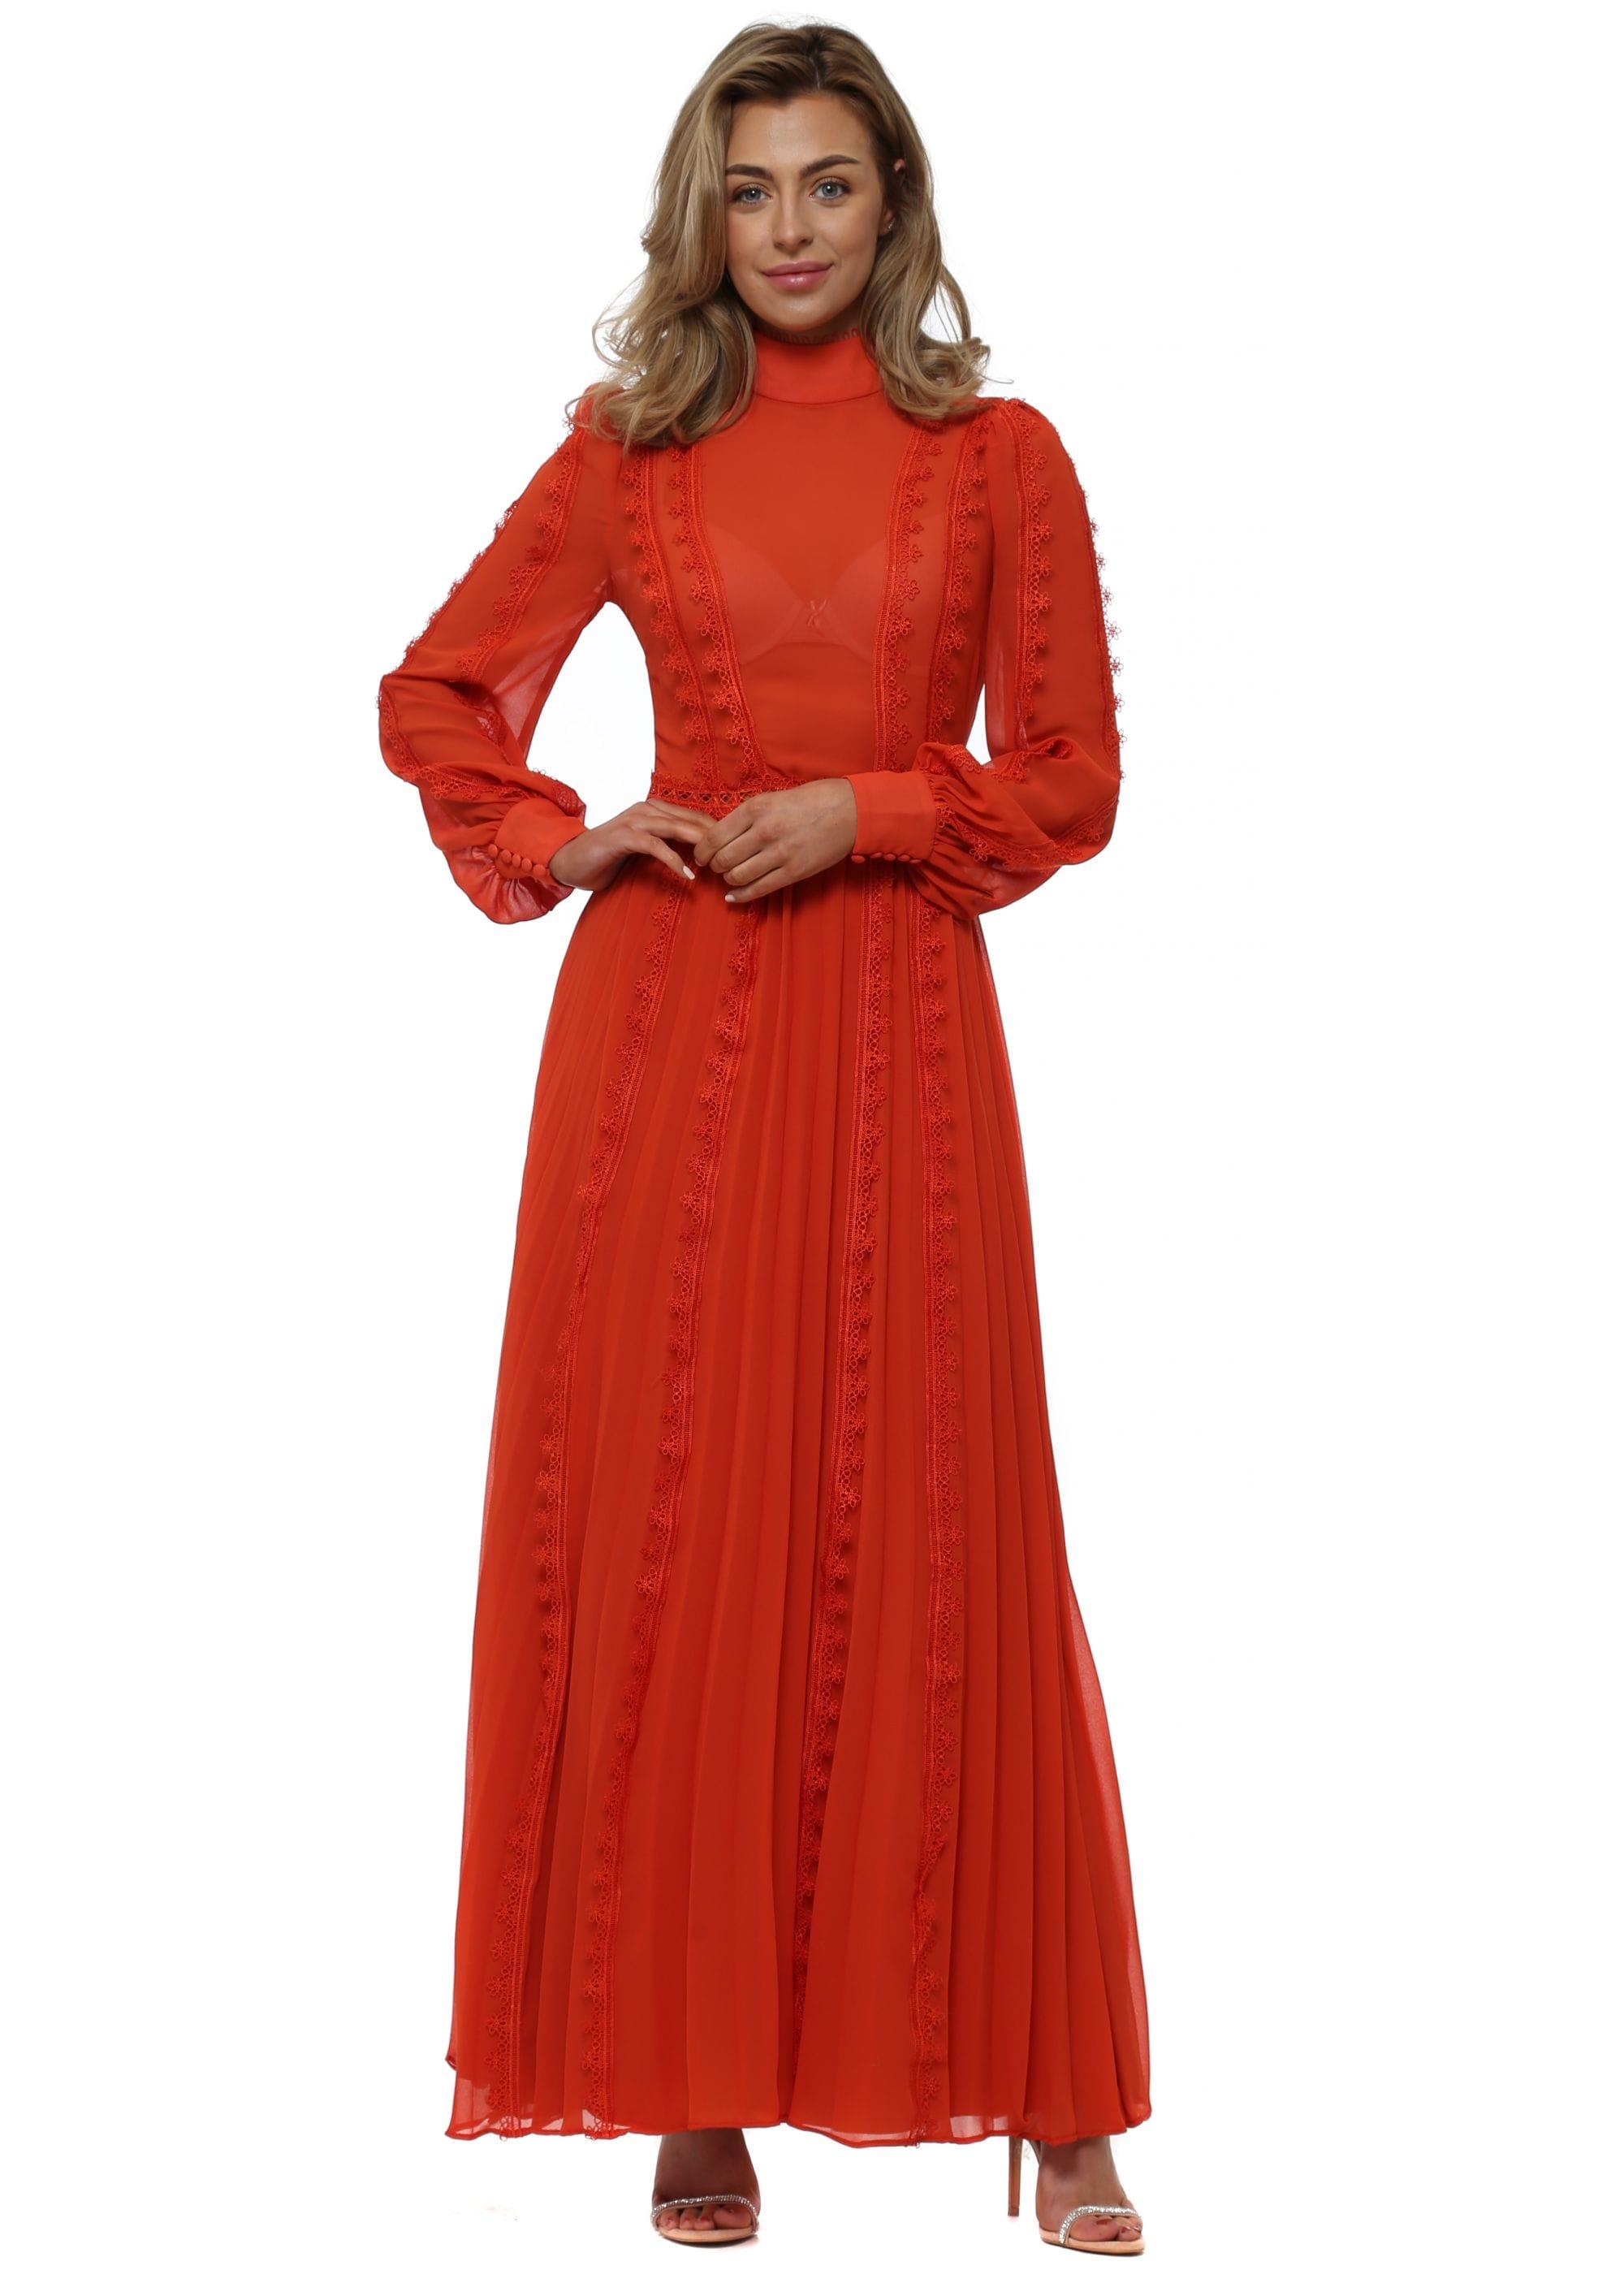 Long Sleeve Maxi Dress,Long Sleeve Maxi Dress,Red Long Sleeve Maxi Dress,Orange Maxi Dresses,Long Orange Maxi Dress,Long Sleeve Maxi Dress,Orange Maxi Dress,Red Long Sleeve Maxi Dress,Long Sleeve Maxi Dress,long sleeve maxi dress,orange maxi dress,orange maxi dress,